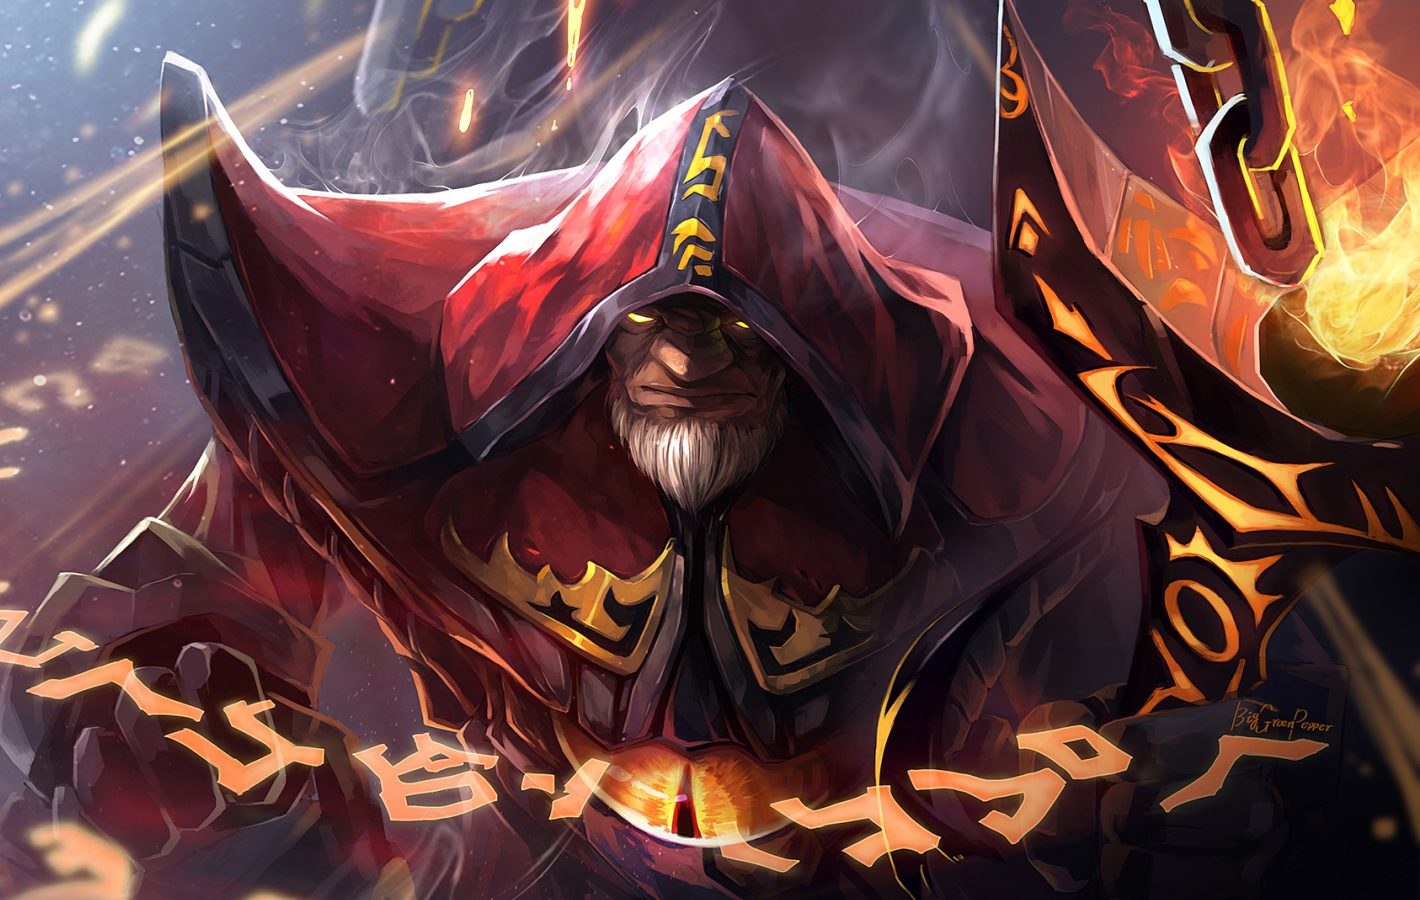 MTG art of a bearded man summoning glowing runes.